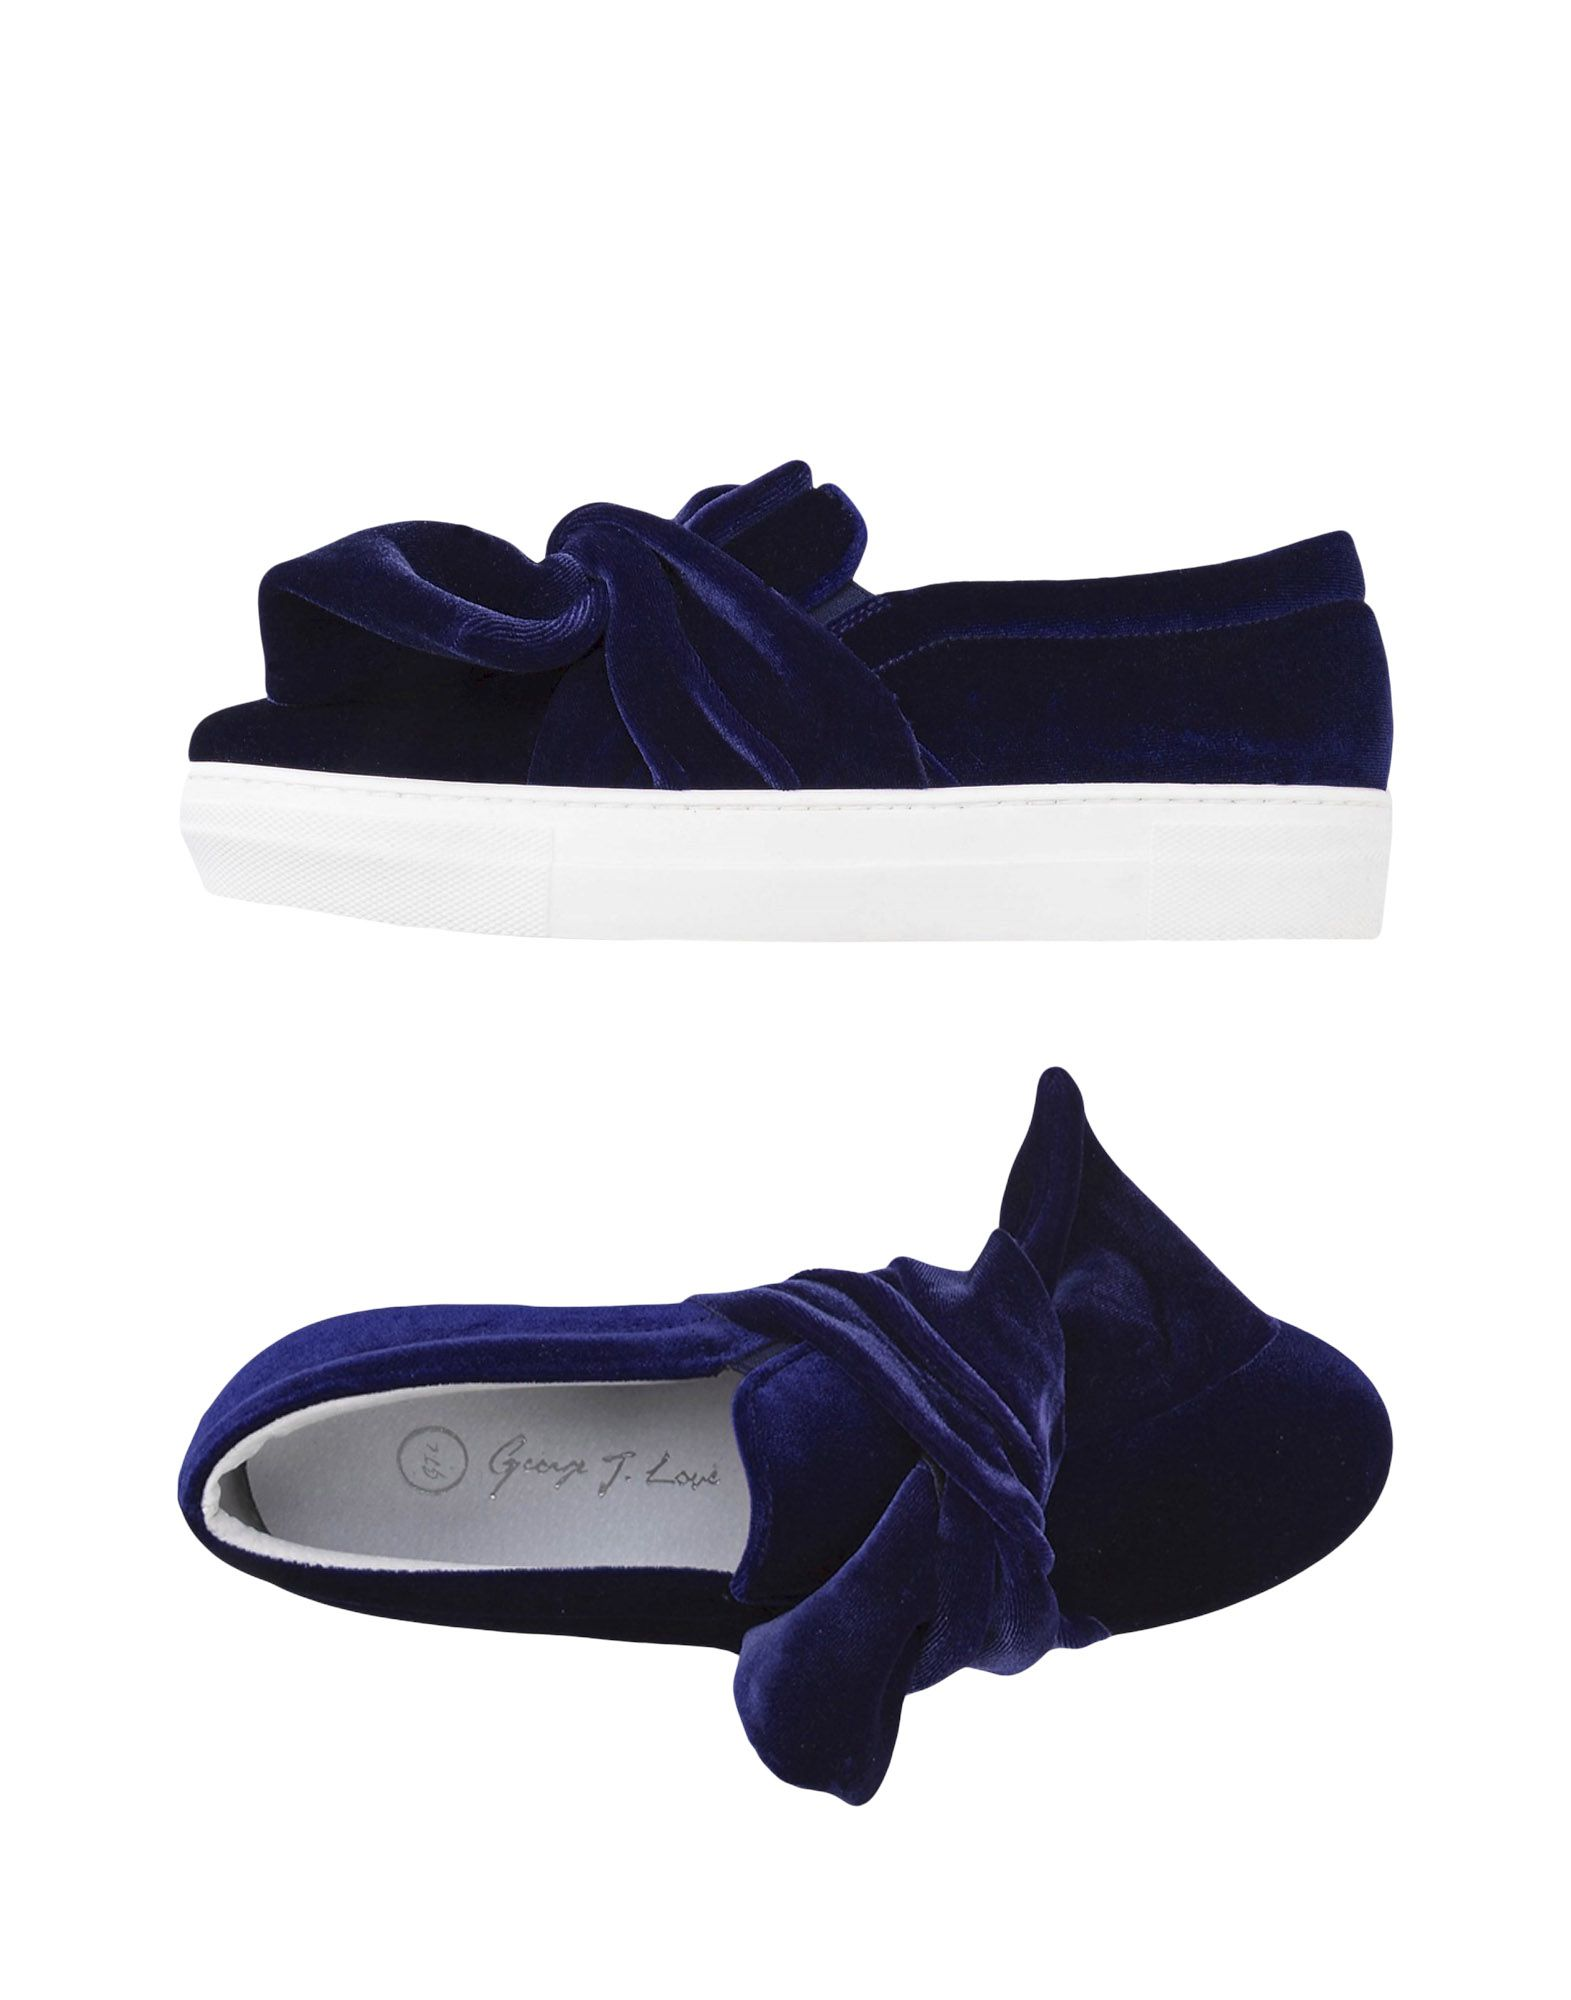 George J. Love Sneakers Damen  11403737DD Gute Qualität beliebte Schuhe